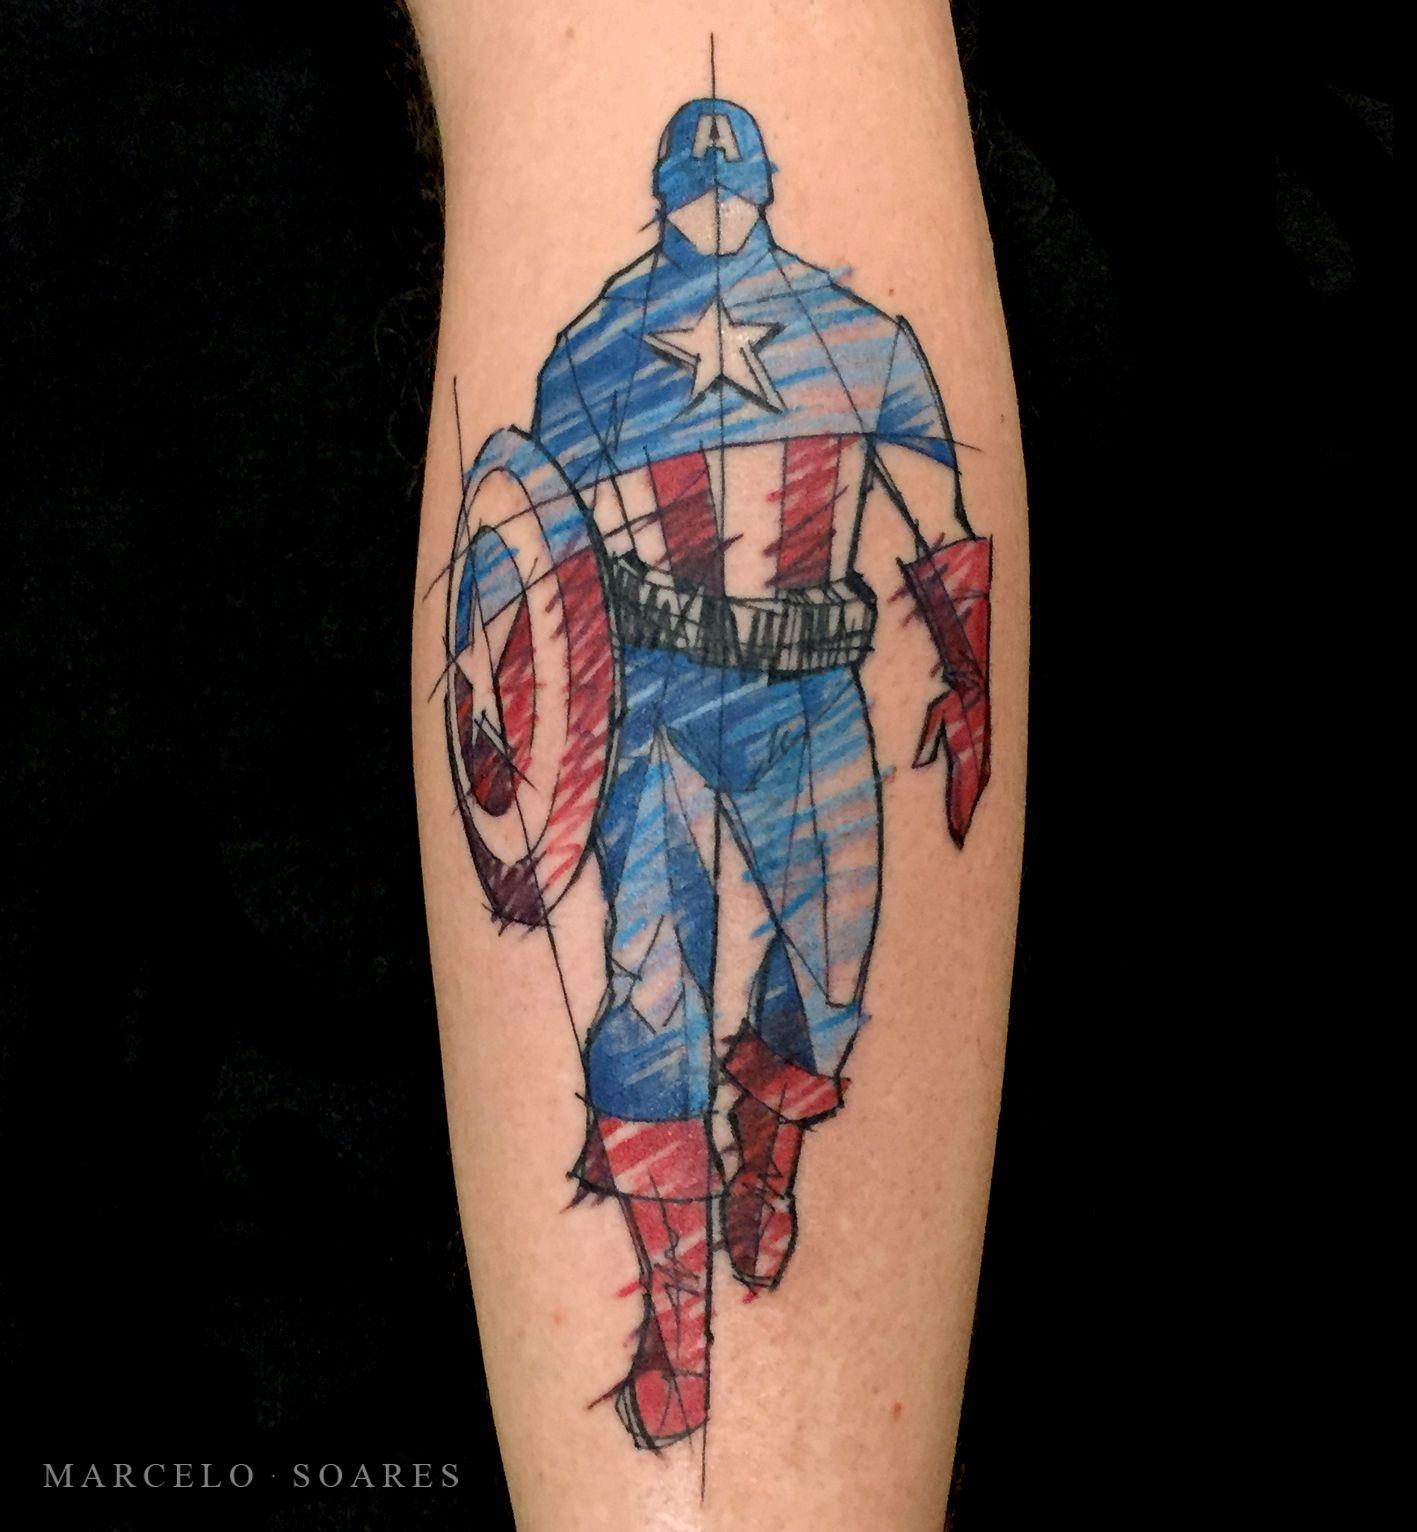 Tatuagem Capitao America Tatuagem Capitao America Ideias De